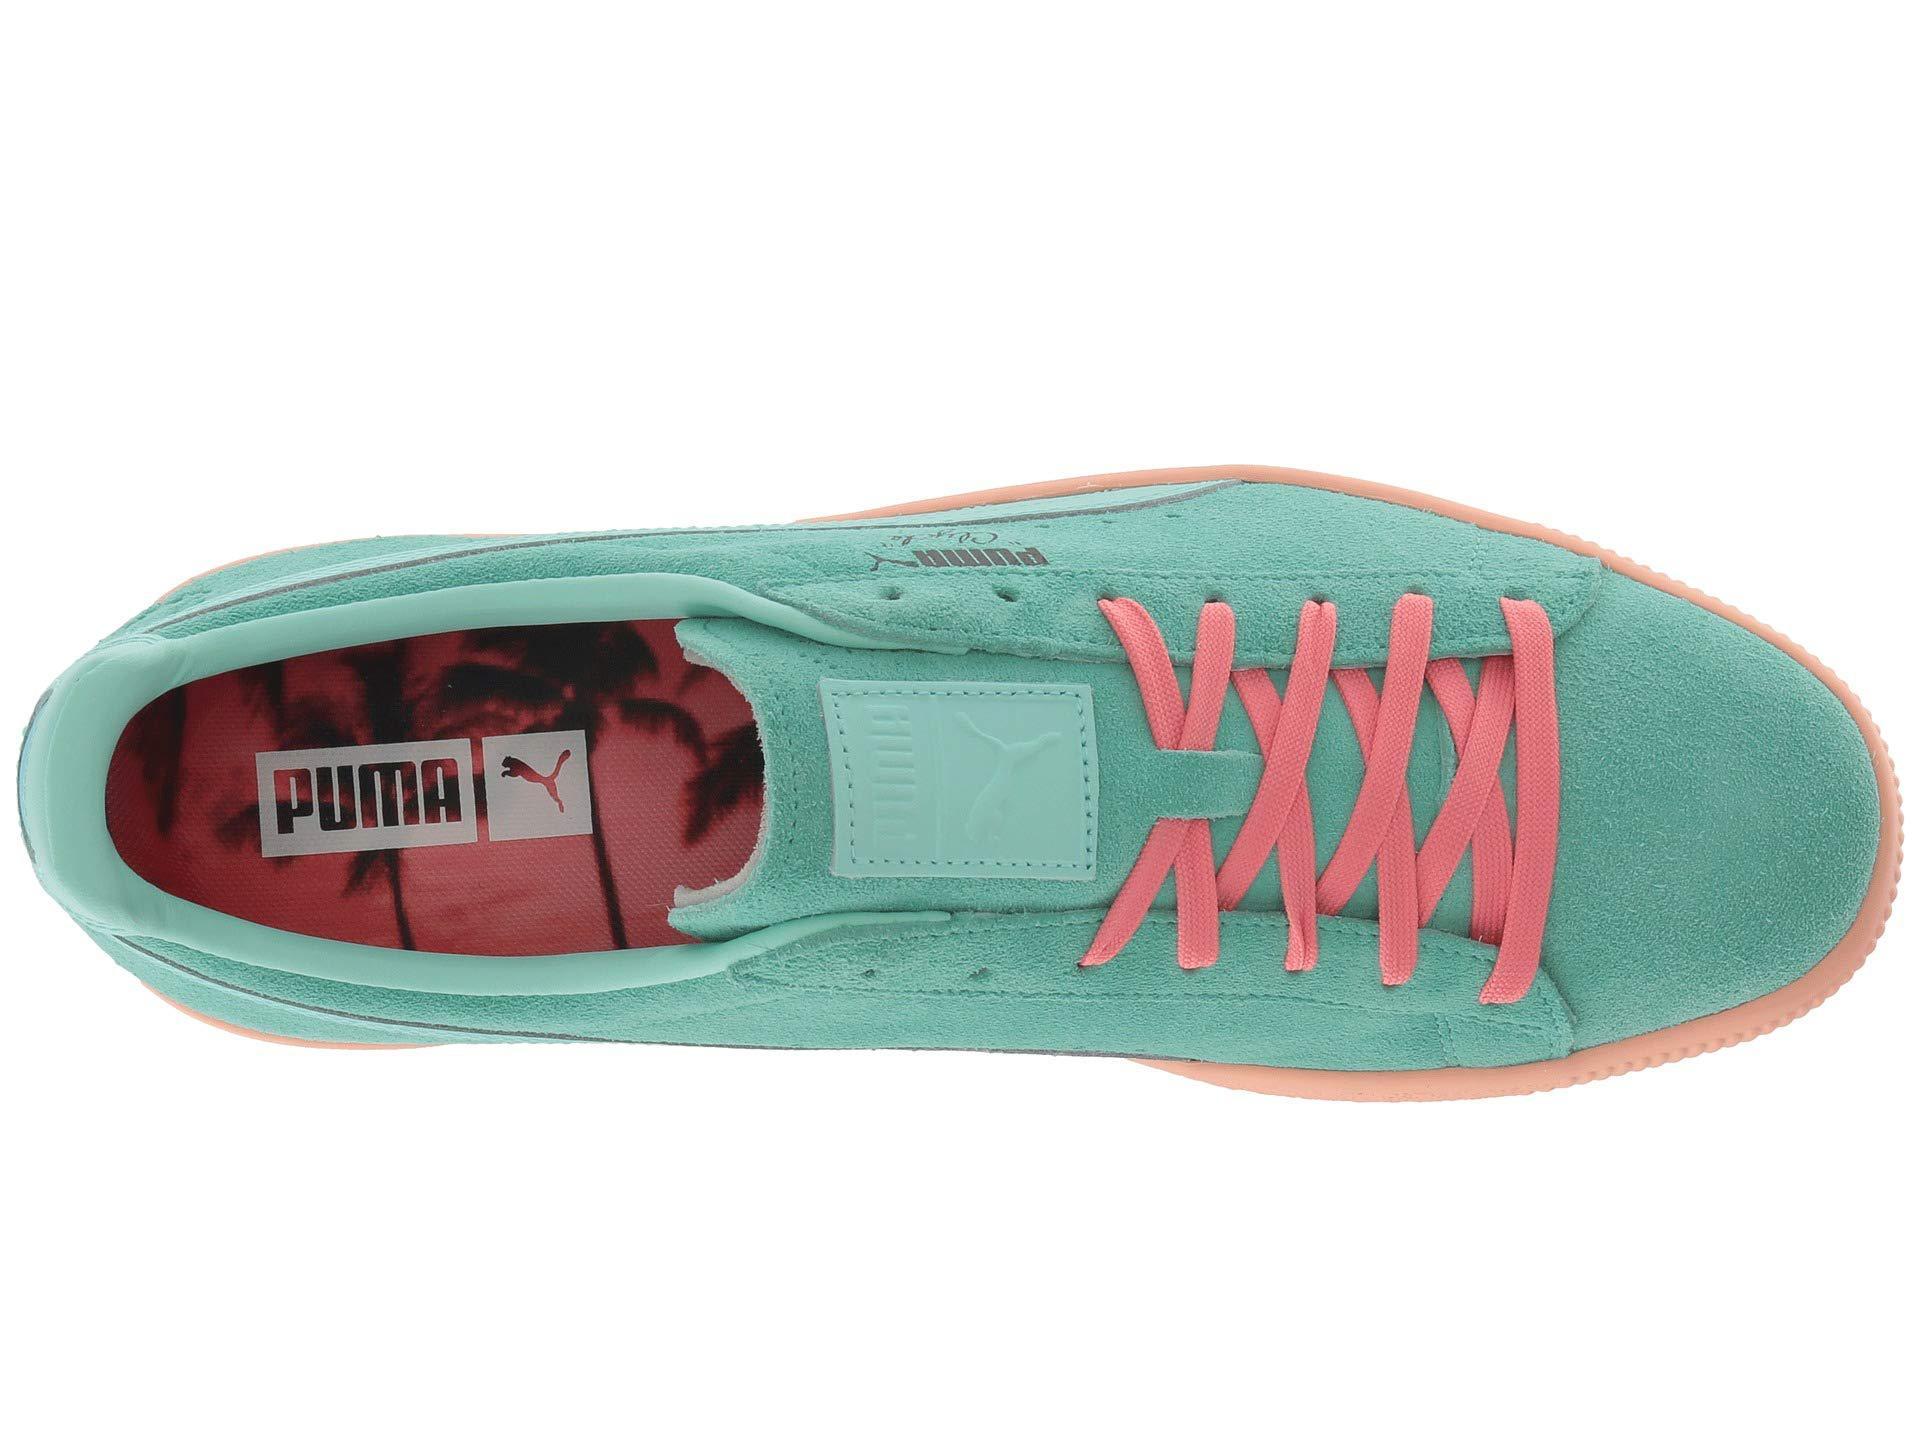 Lyst puma clyde south beach biscay green bay mens shoes jpg 1920x1440 Clyde  south beach sneakers dd645b5e9